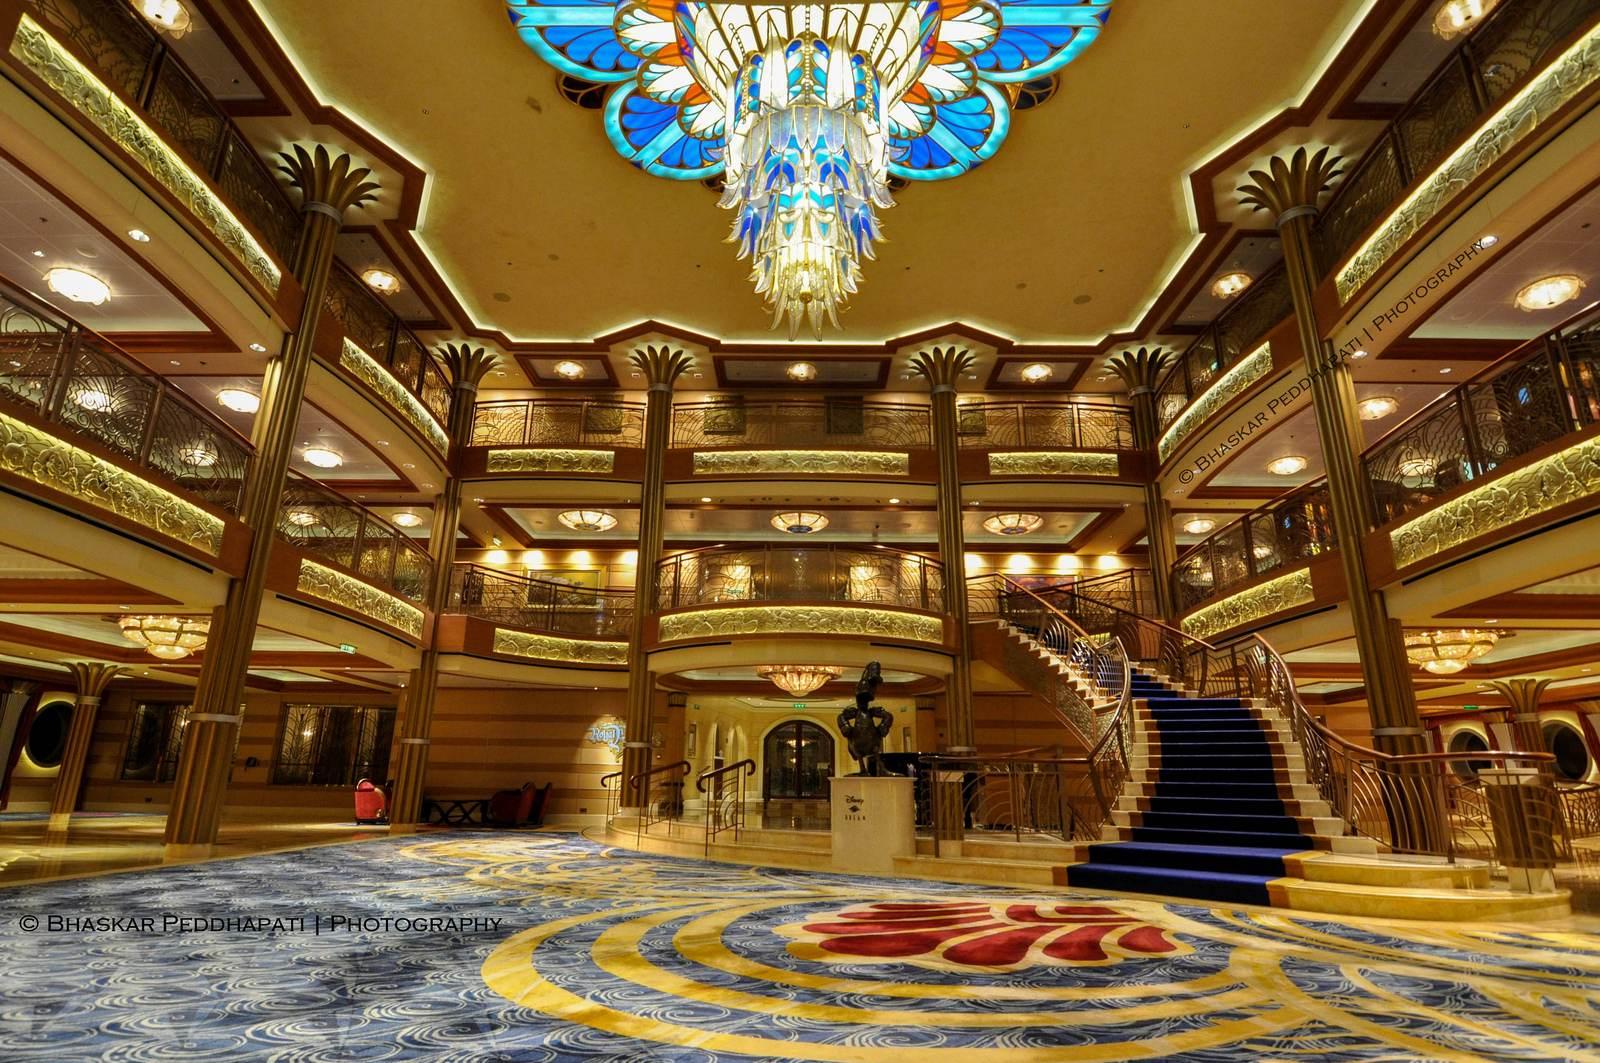 disney dream1 Disney Dream Cruise Ship